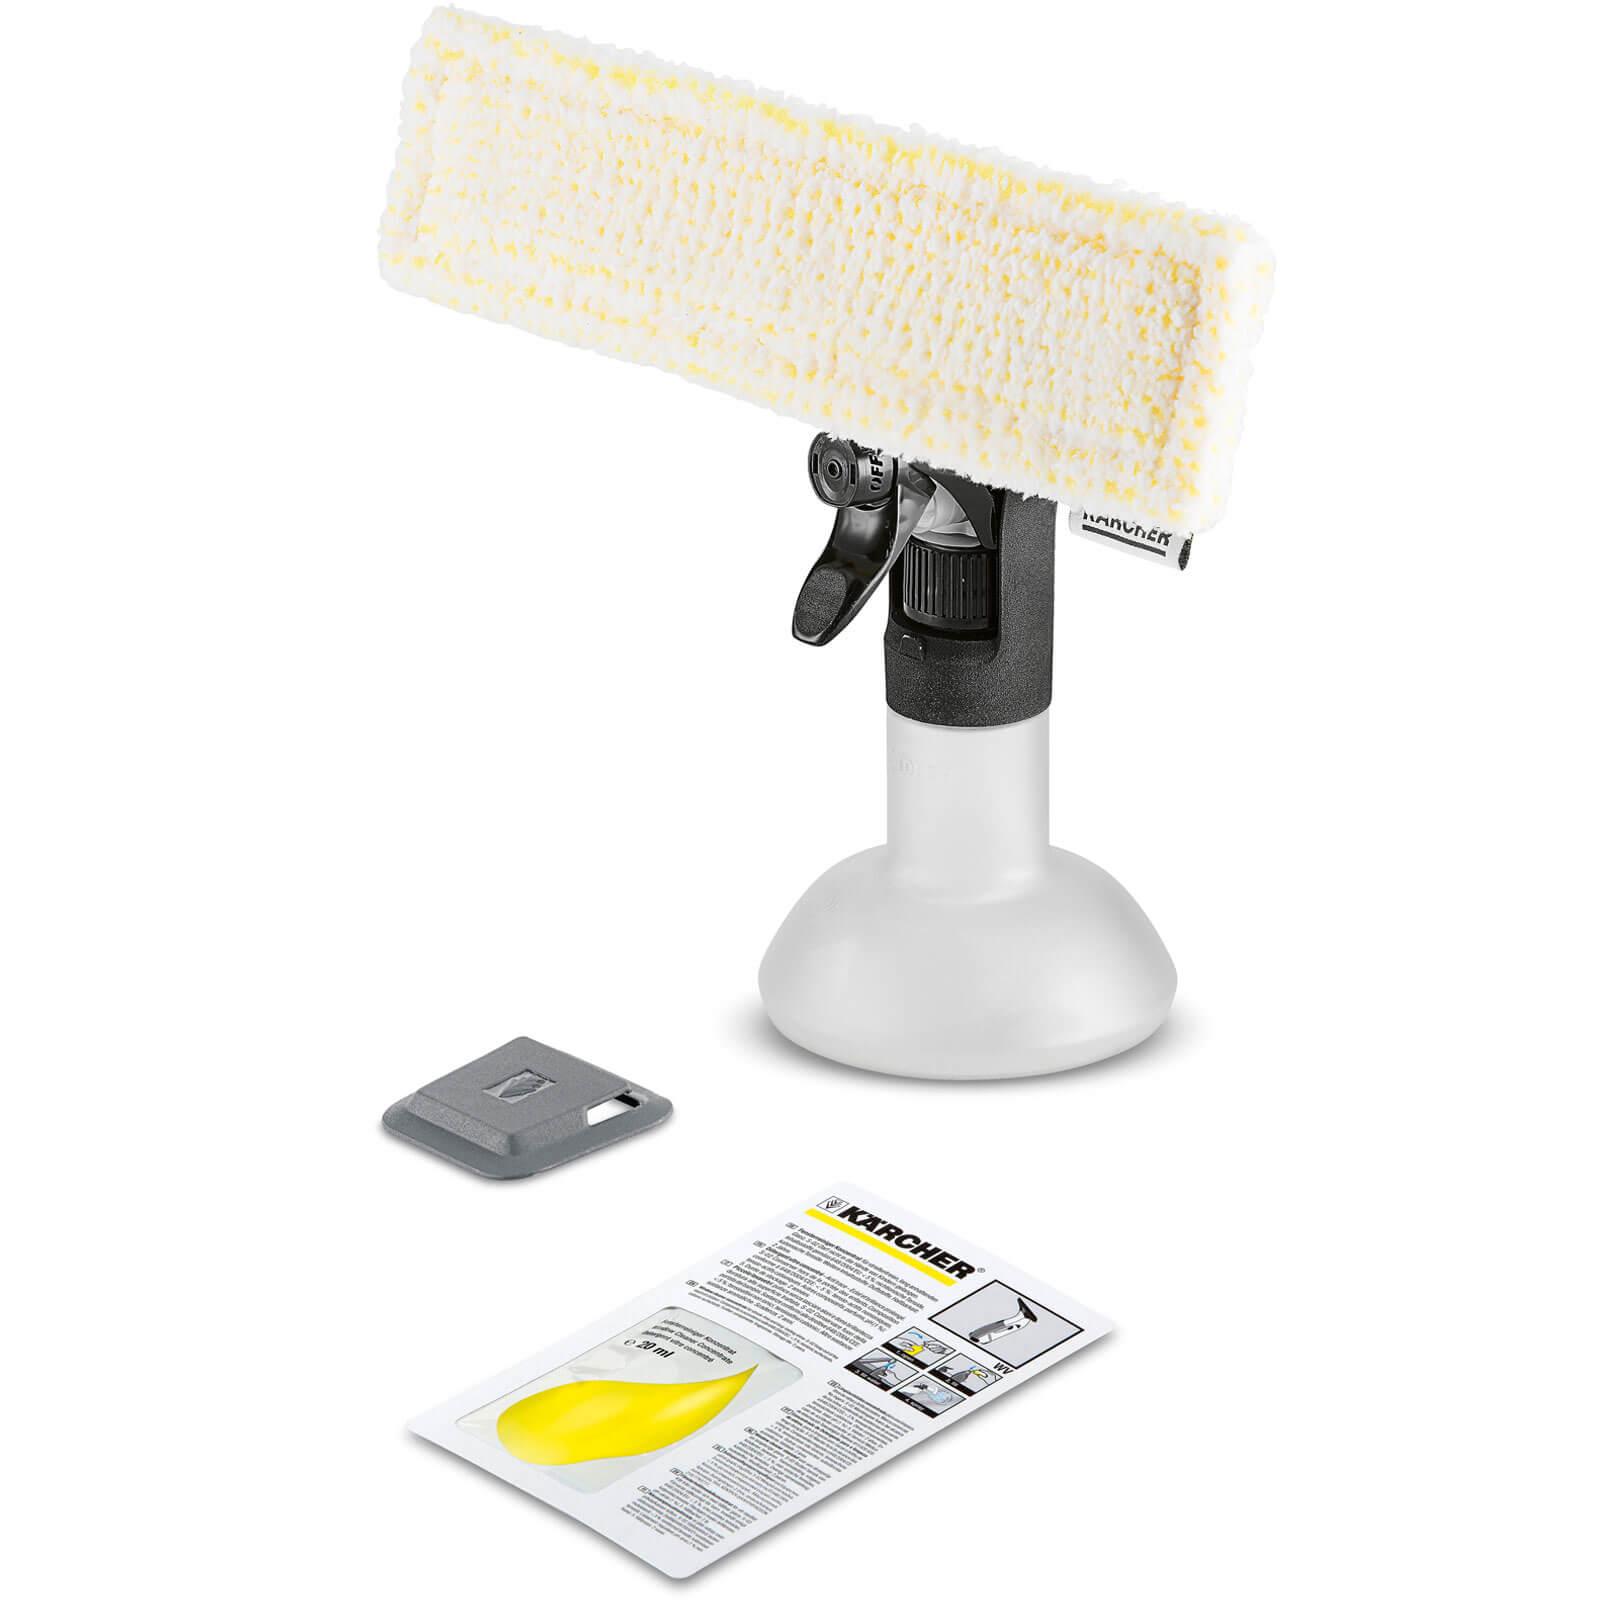 Karcher Premium Spray Bottle and Microfibre Pad Kit for Window Vacs